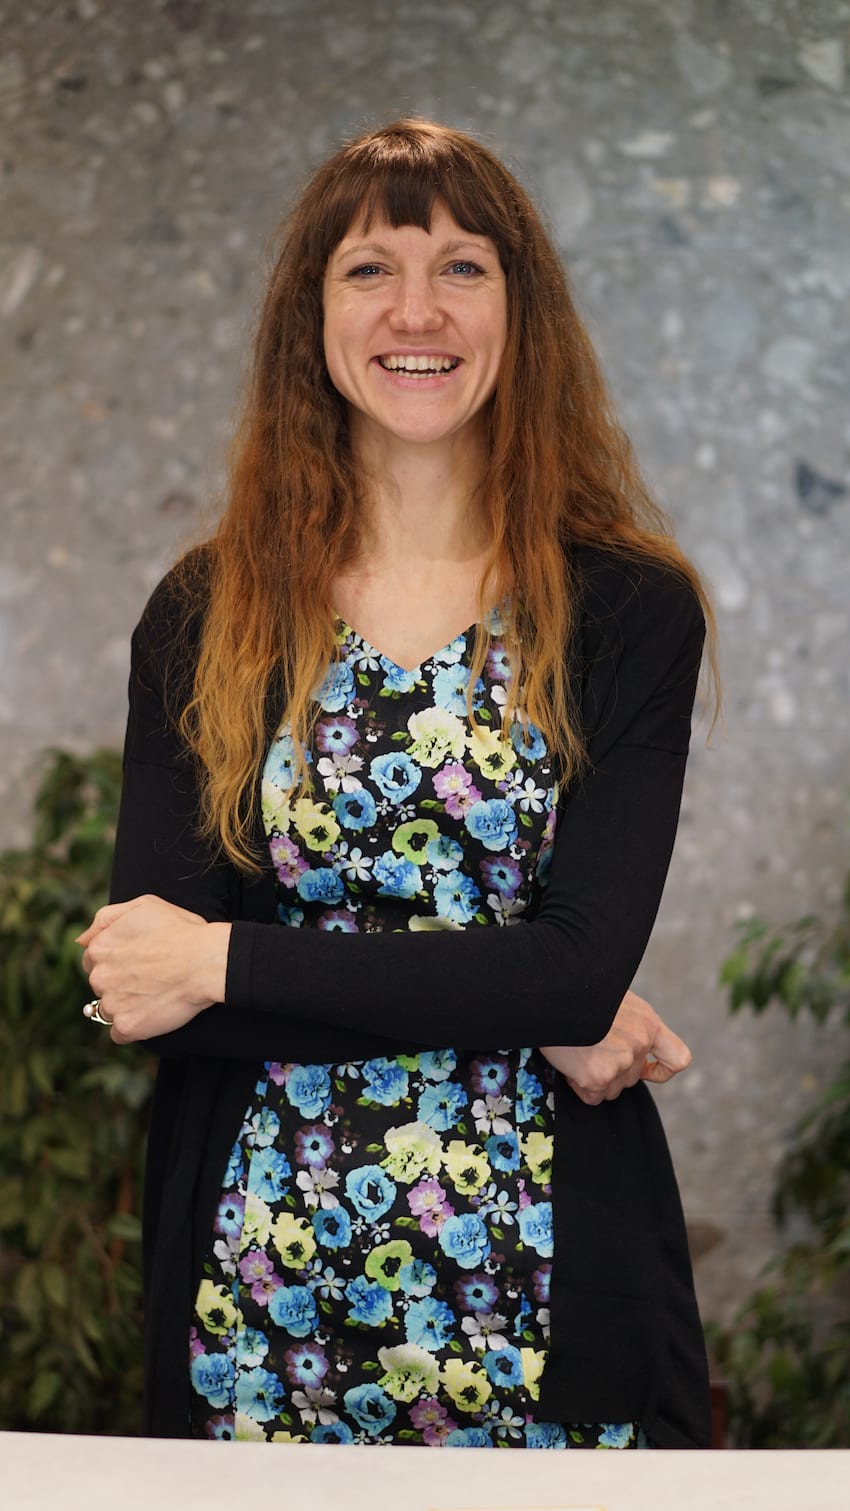 Katarzyna Lessmann Czardybon